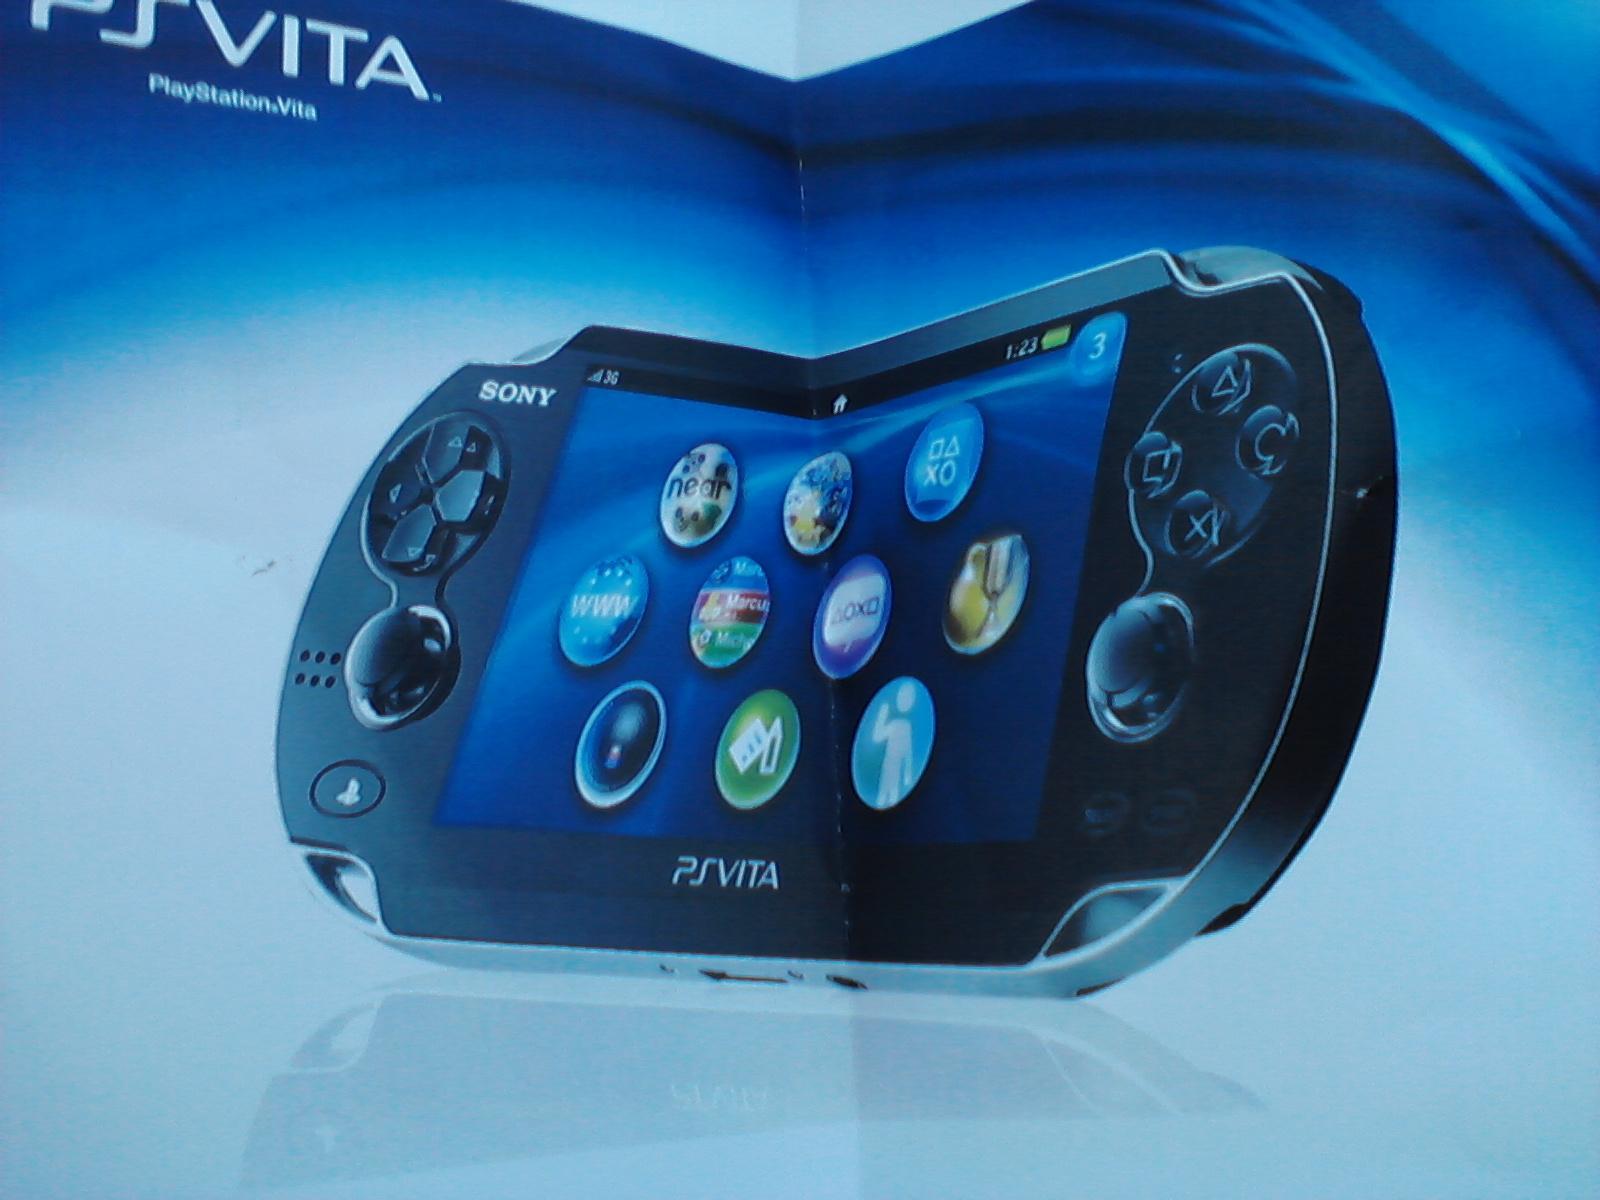 Dossier complet sur la future console de jeu portable PlayStation Vita de Sony